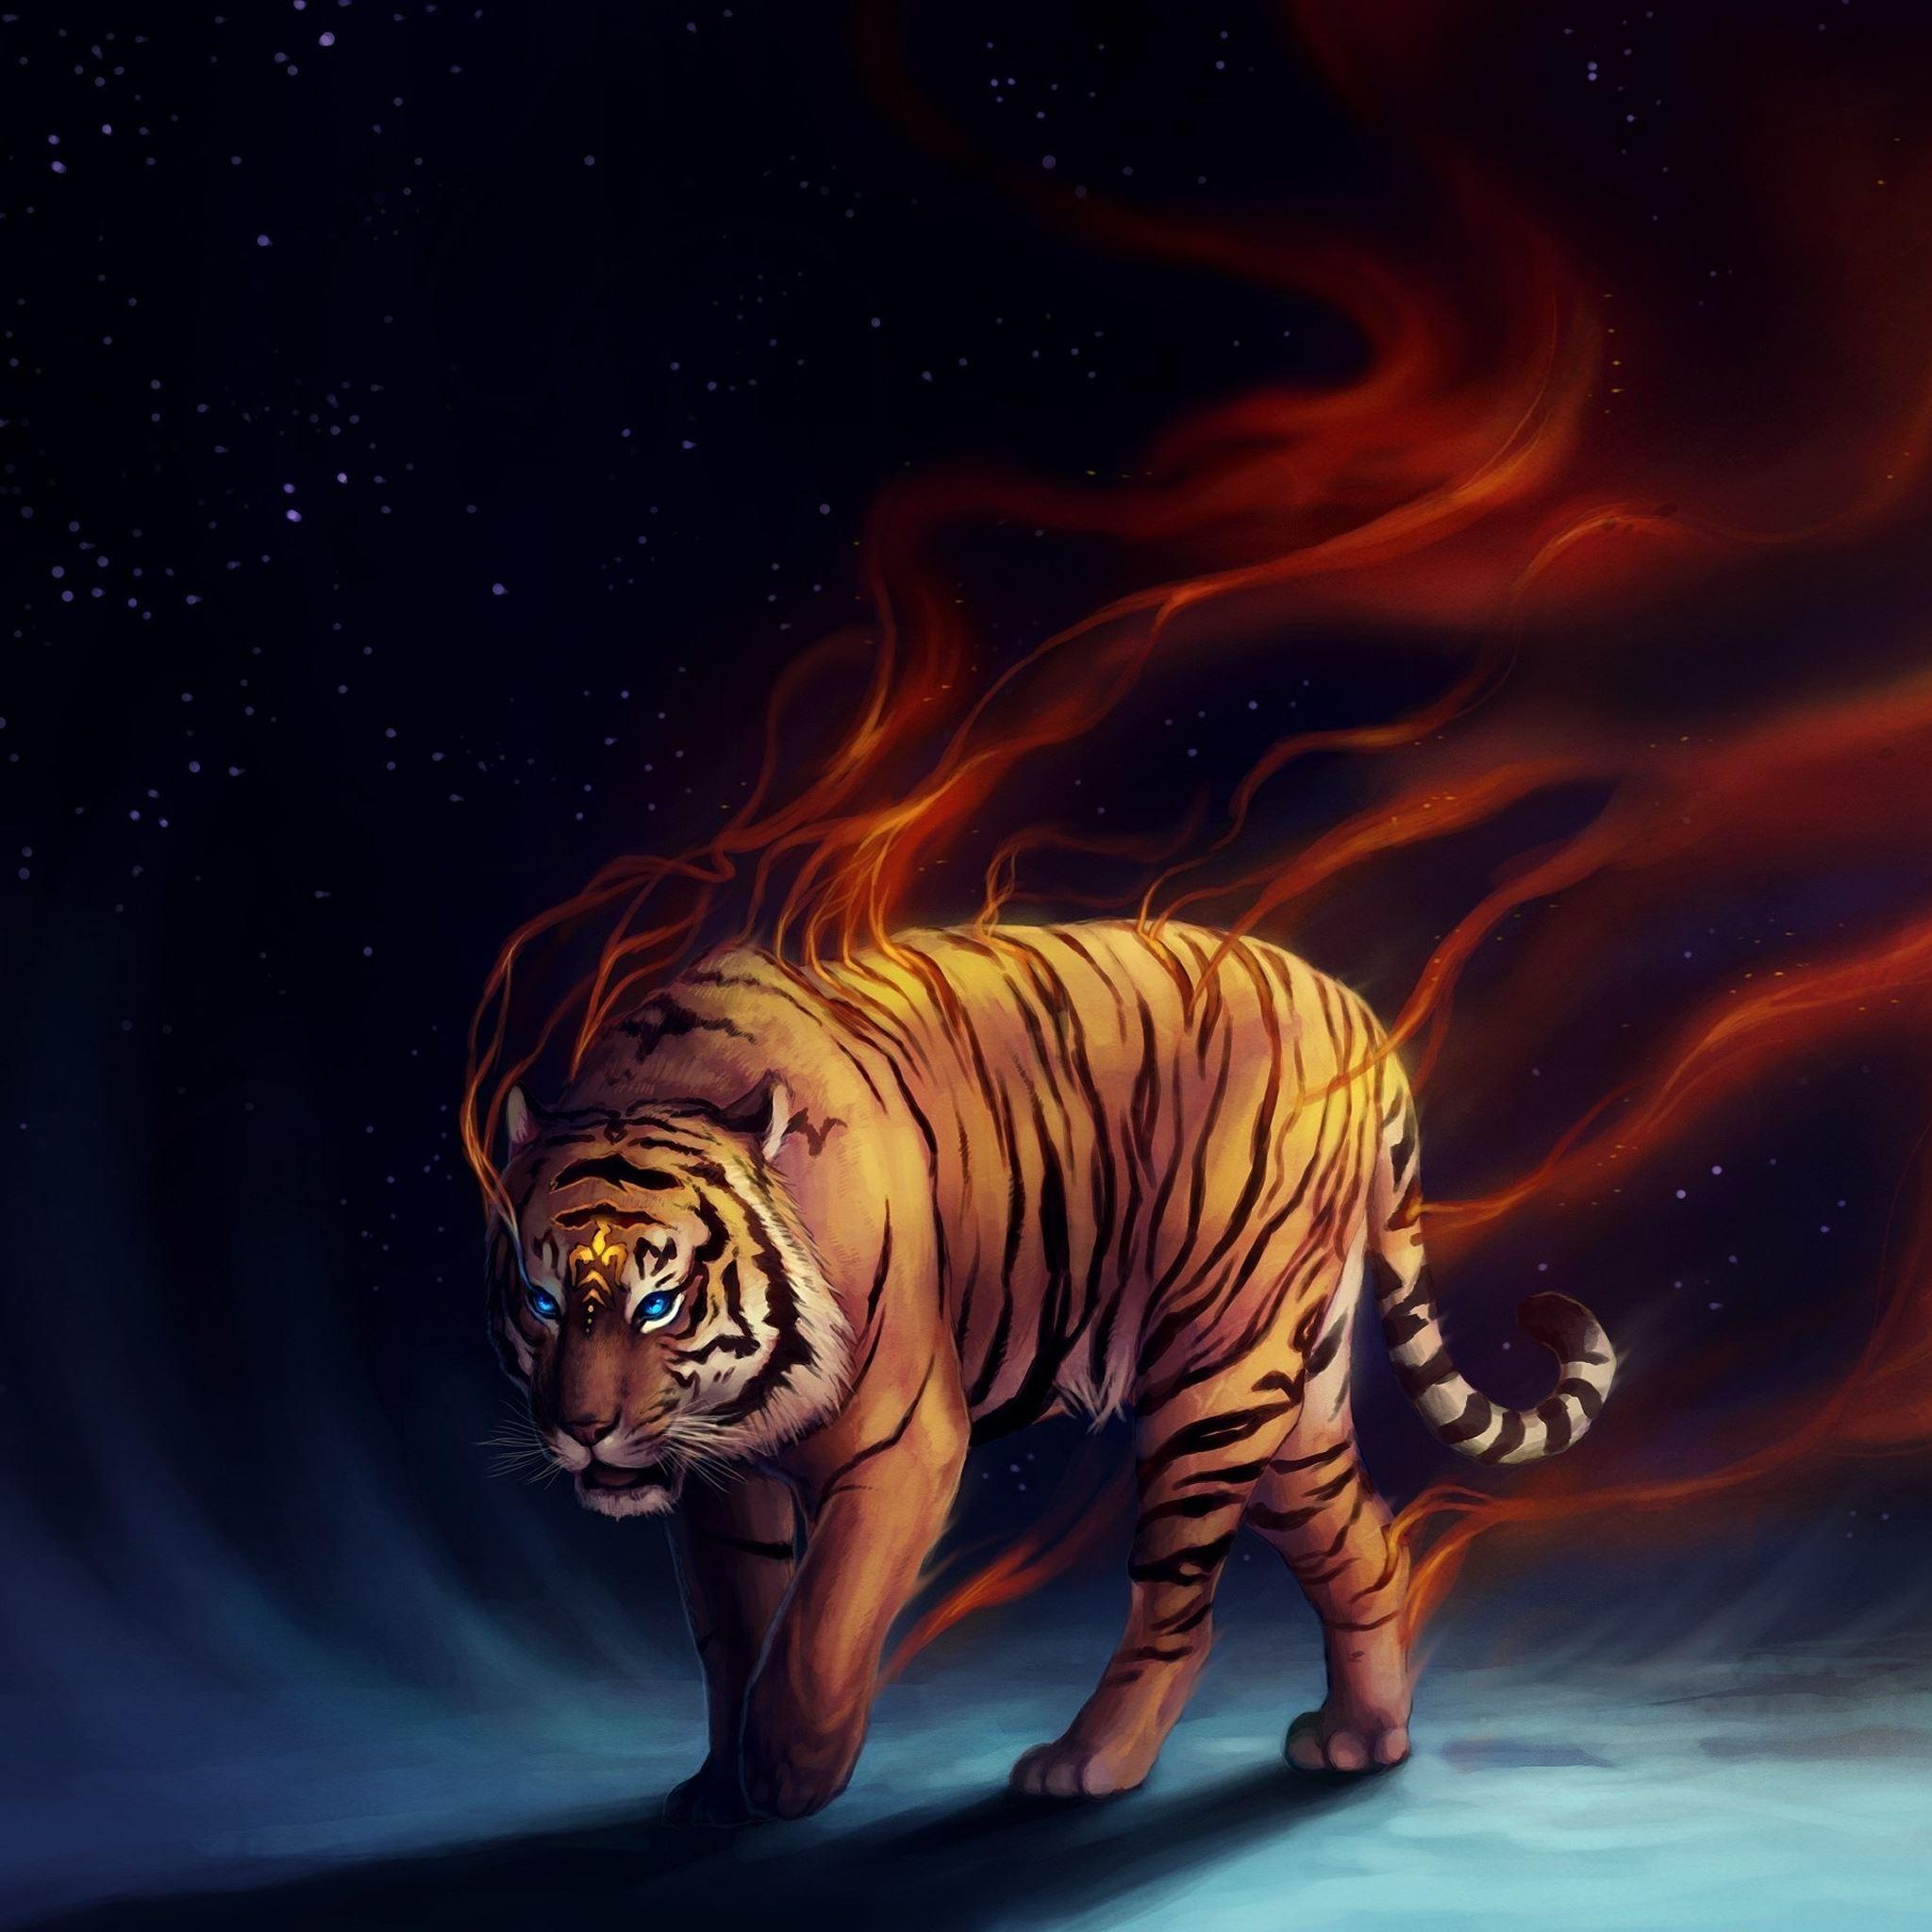 The Tiger iPad Air wallpaper